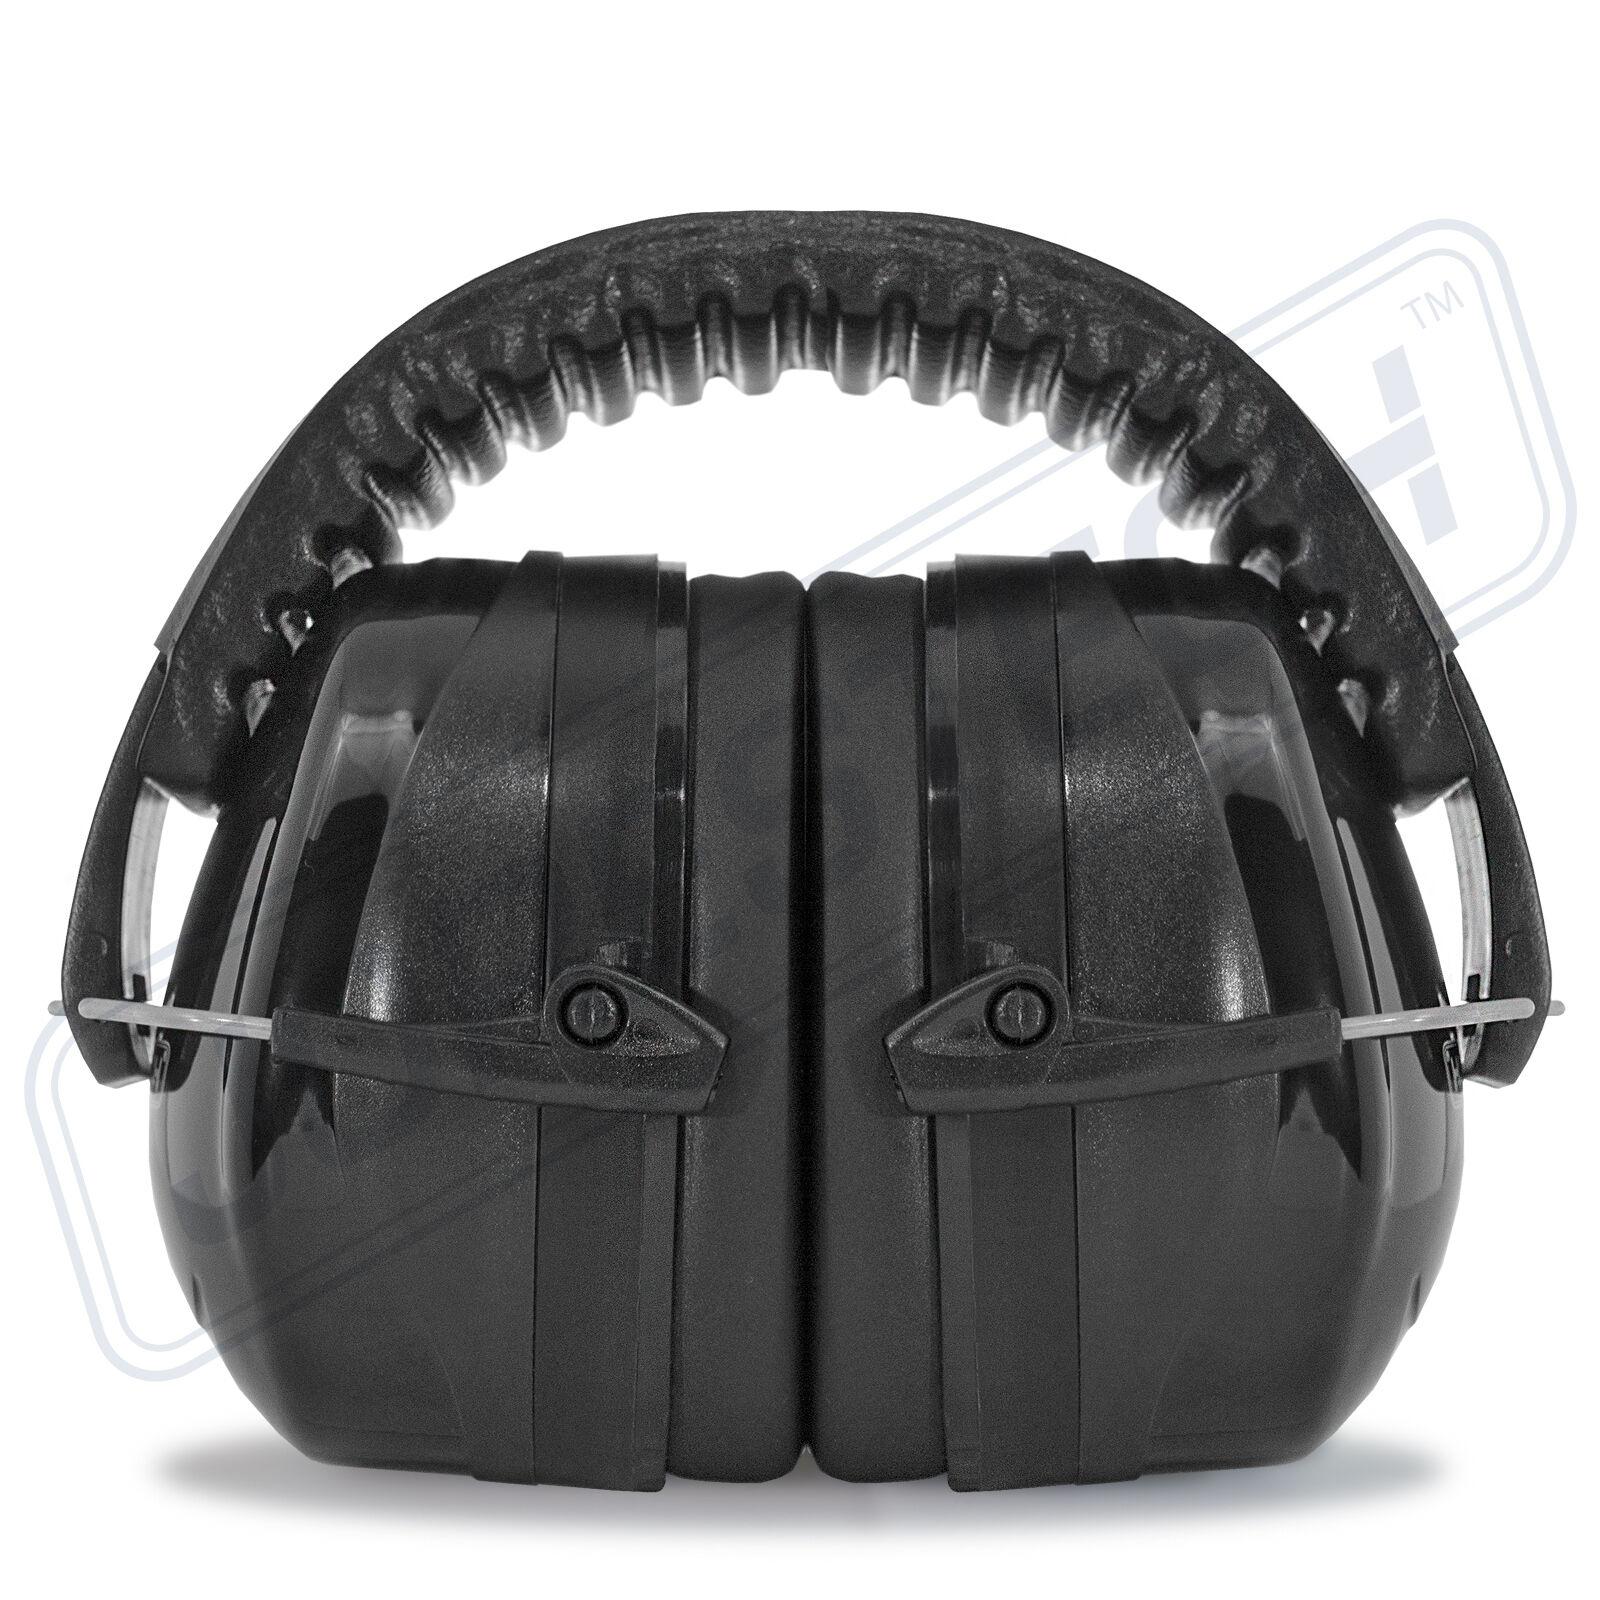 Ear Muffs Hearing Foldable Noise Reduction Protection Gun Sh